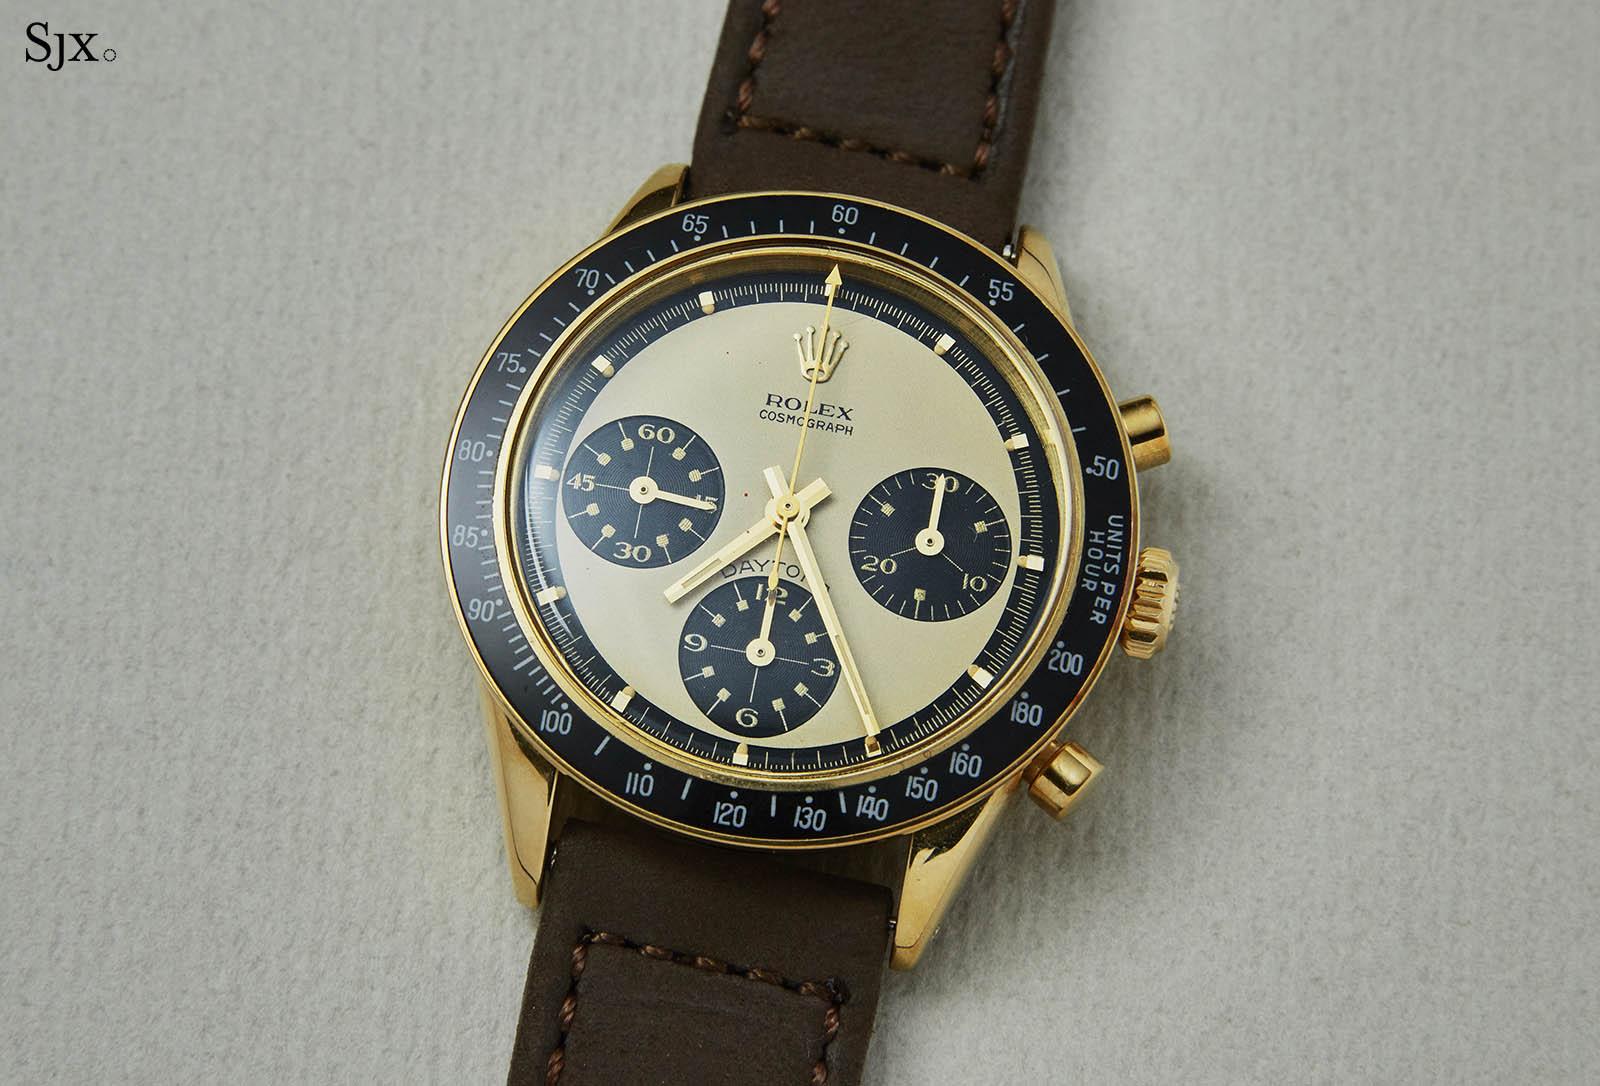 Rolex Cosmograph Daytona Paul Newman ref. 6241